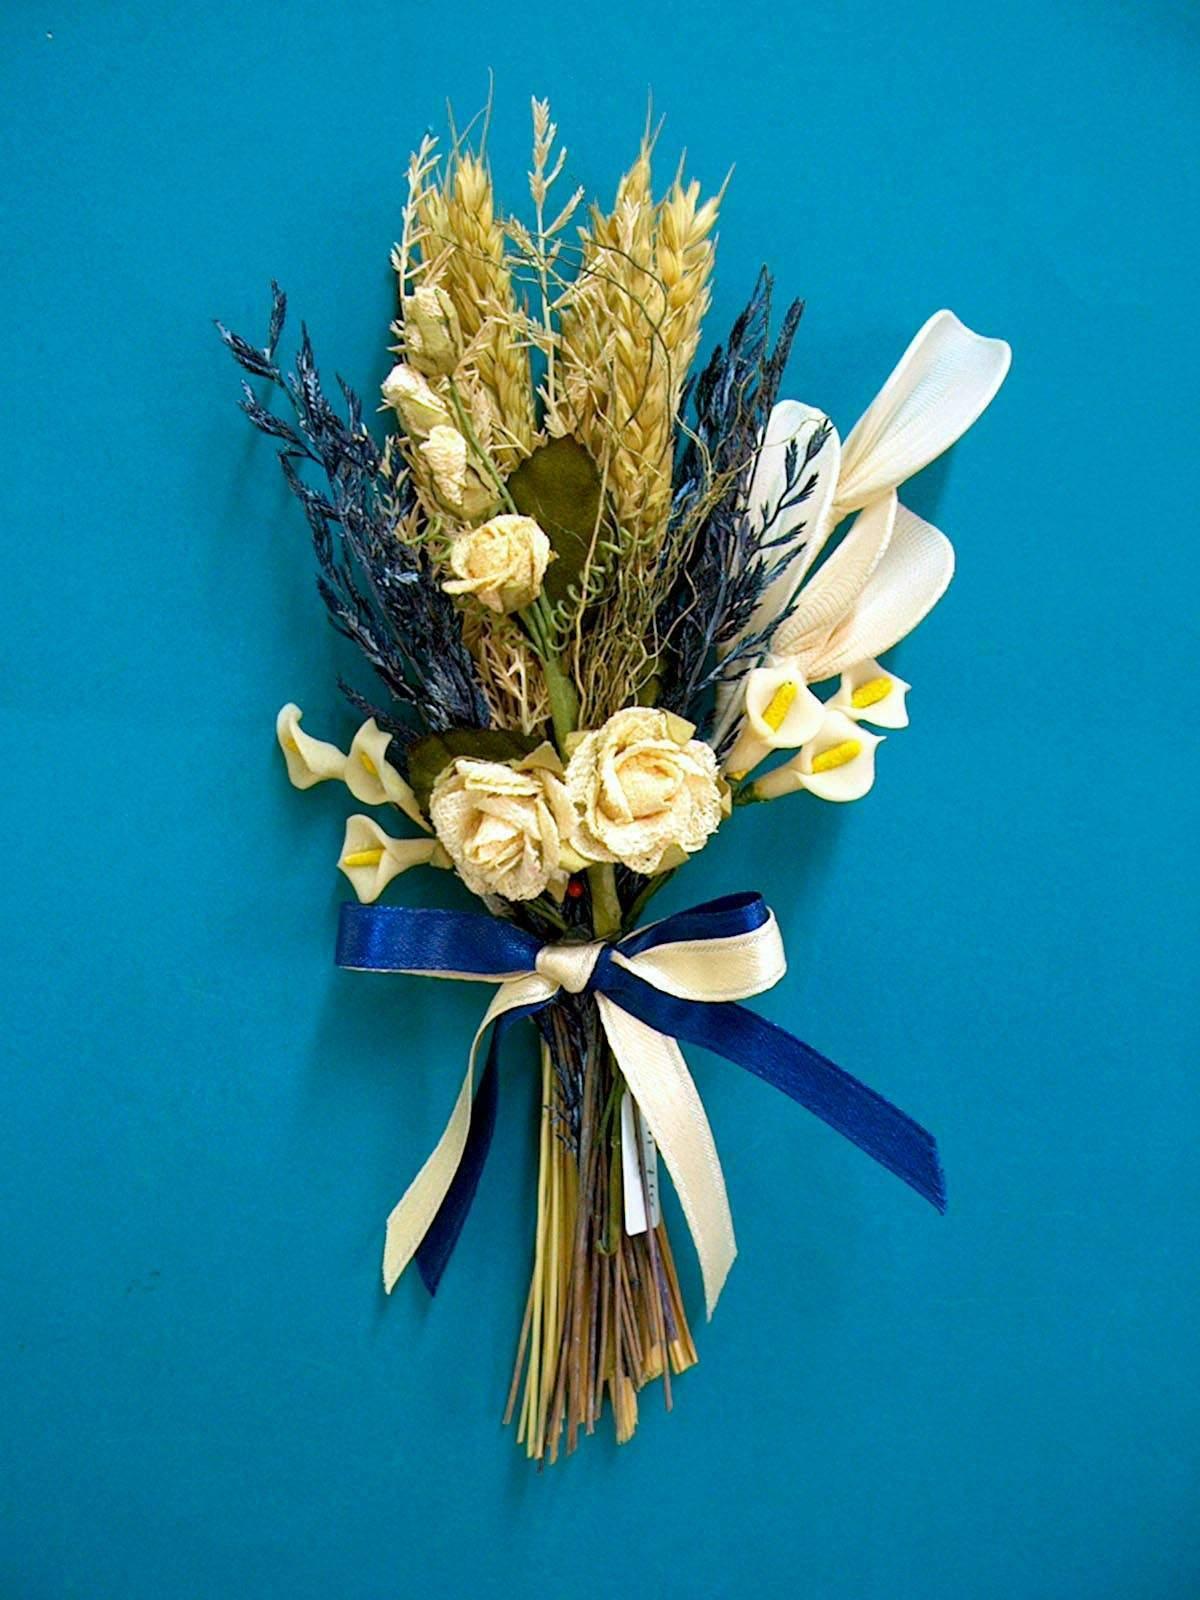 File:Dried flowers.jpg - Wikipedia